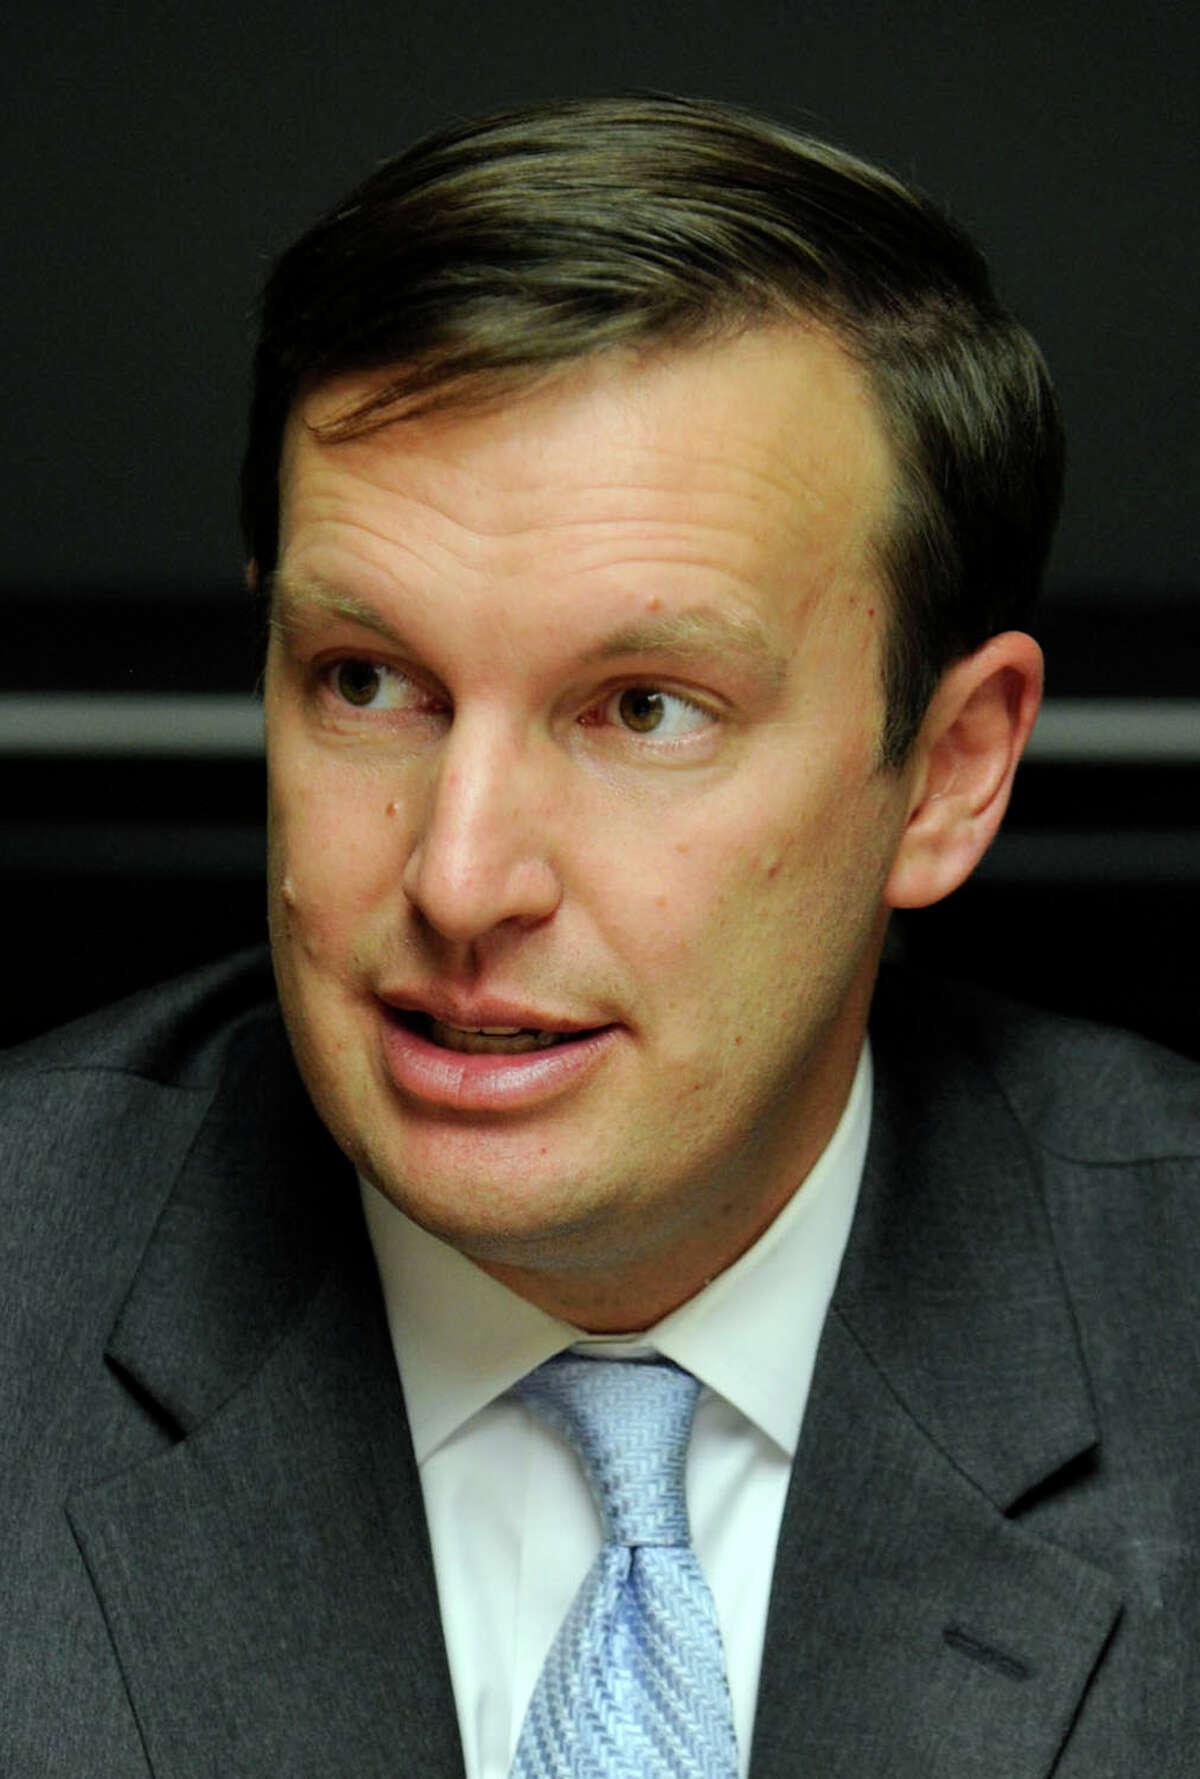 U.S. Senator Chris Murphy